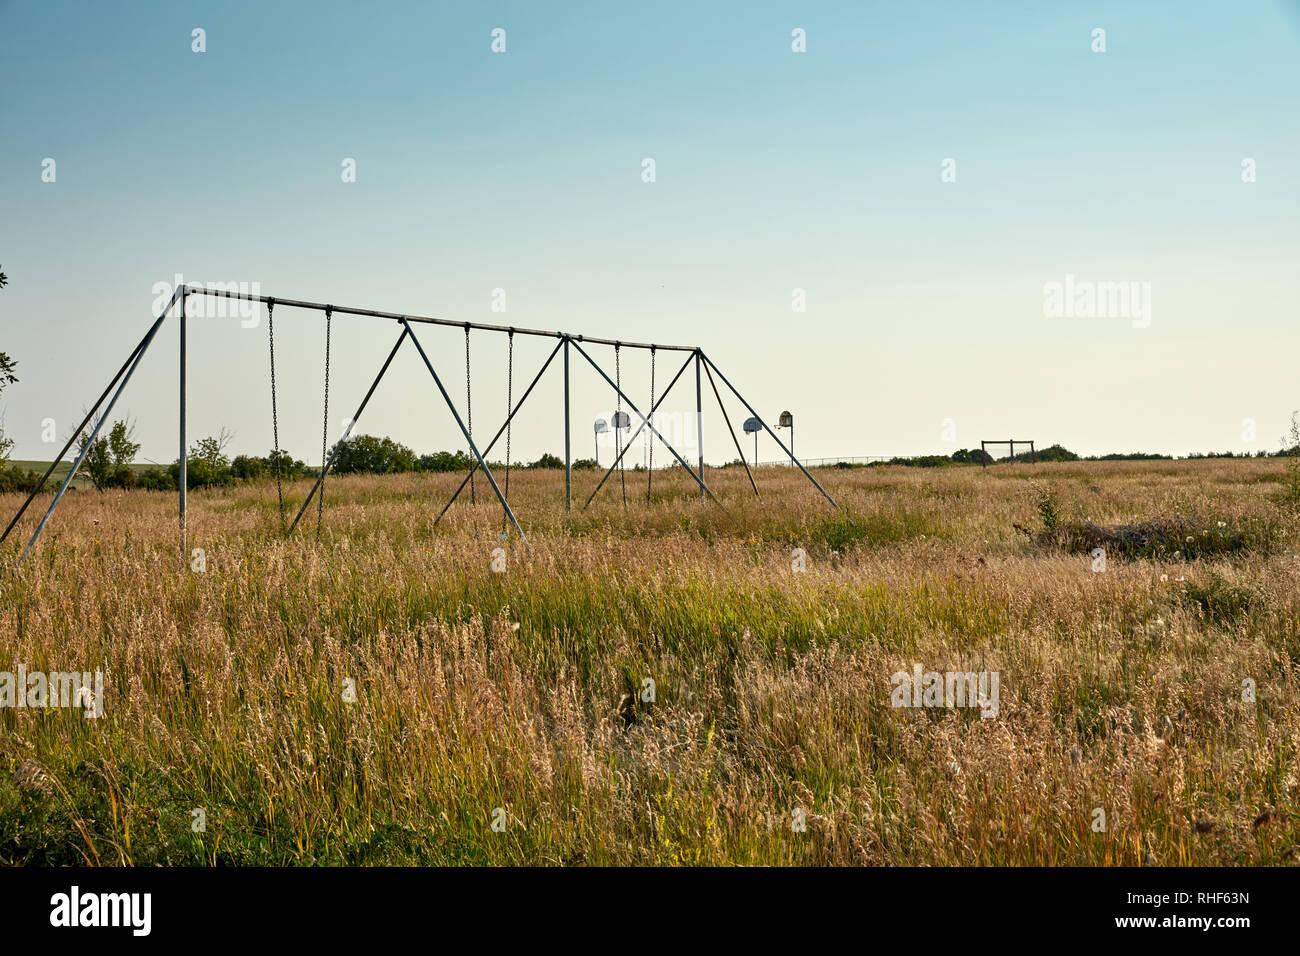 Abandoned swingset and playground in Western North Dakota - Stock Image